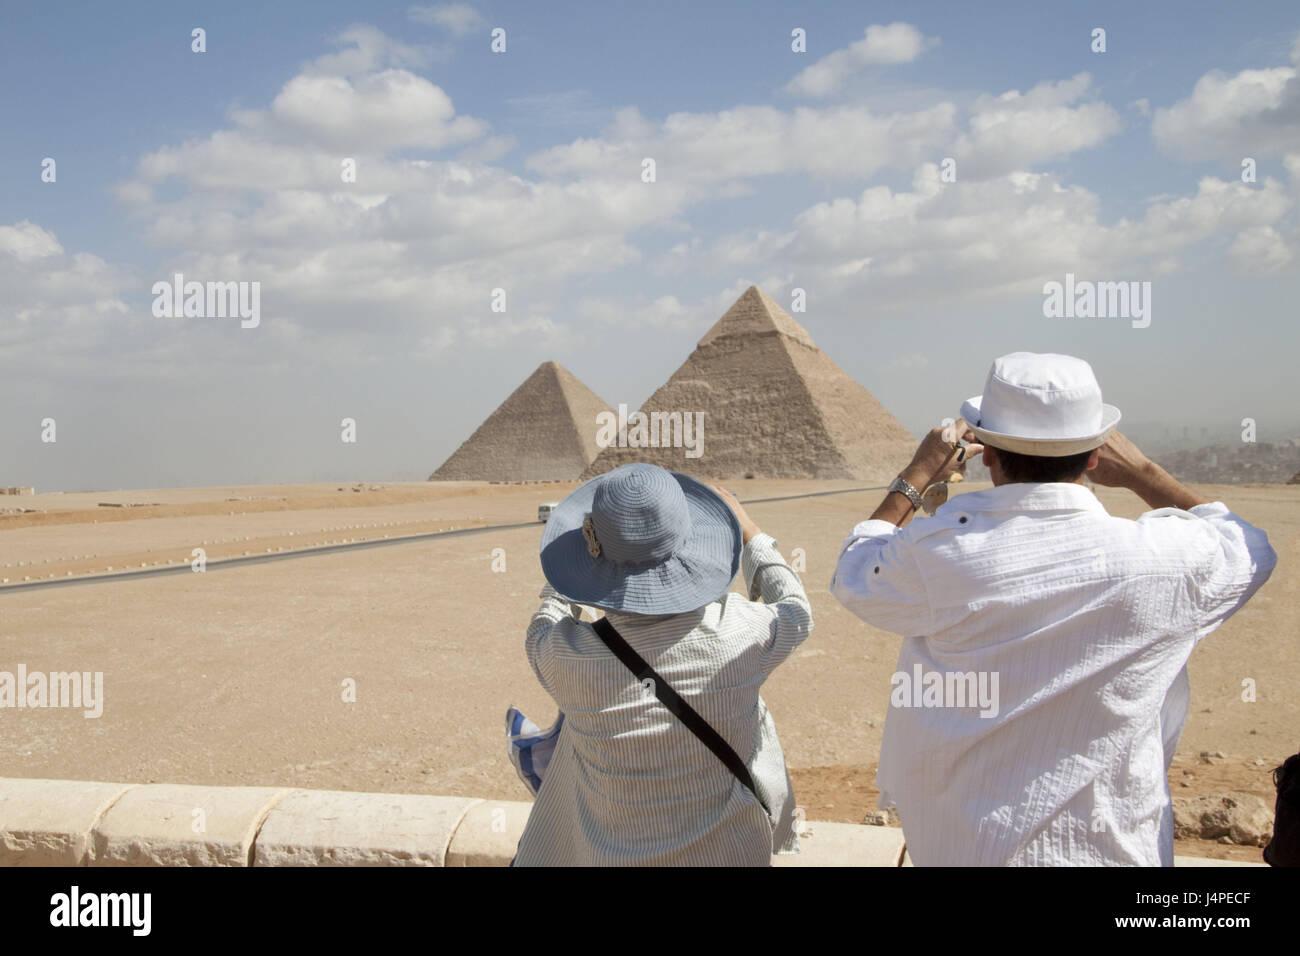 Ägypten, Tourist paar, fotografieren, Pyramiden, Kairo, Person, paar, Tourist, Rückansicht, solar Mützen, Stockbild